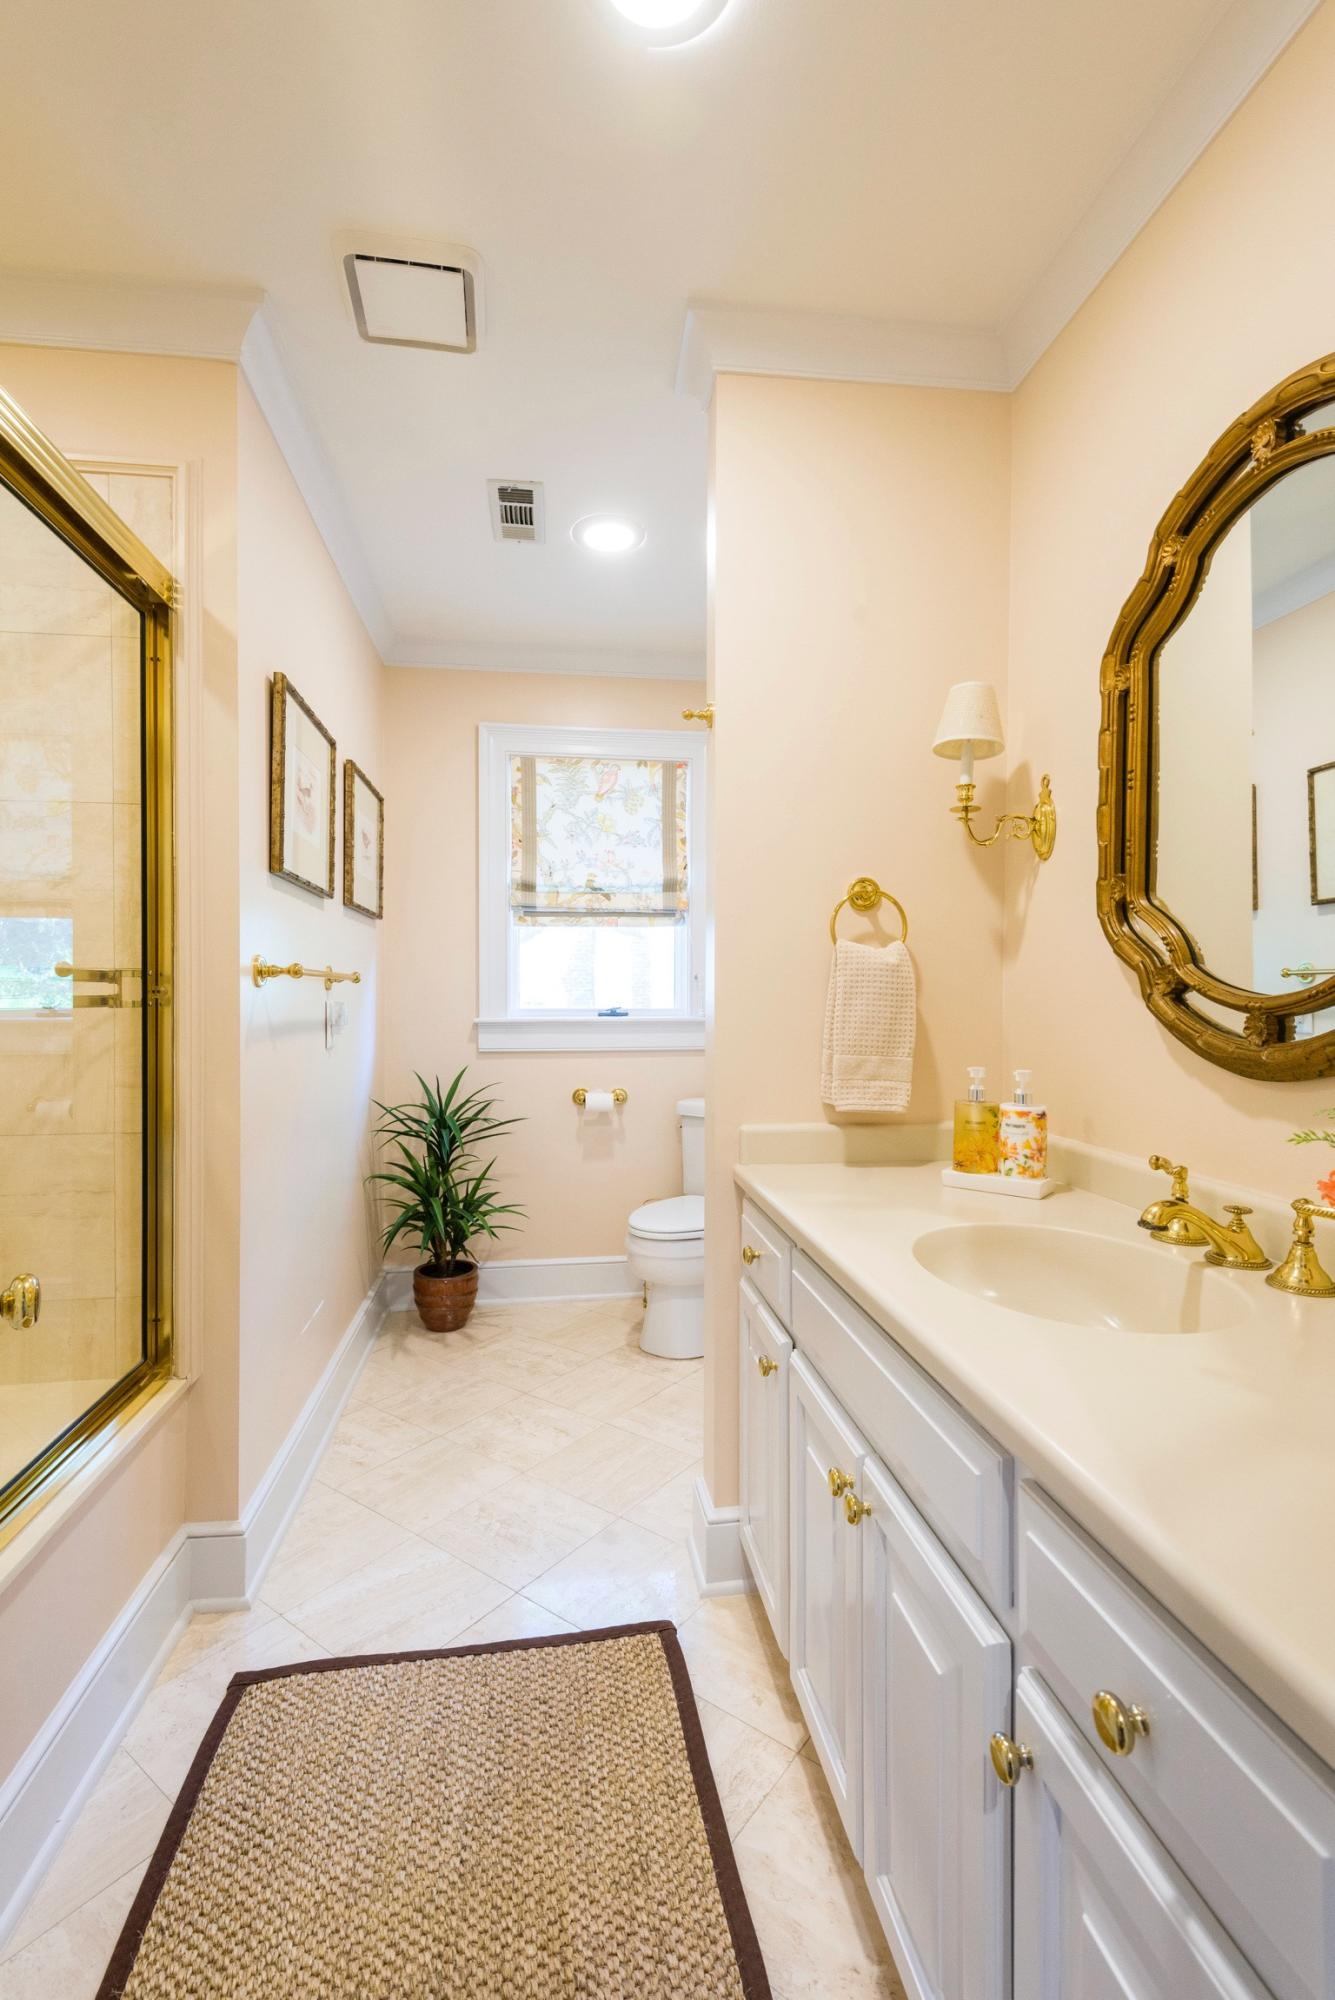 Lawton Bluff Homes For Sale - 685 Shore, Charleston, SC - 14